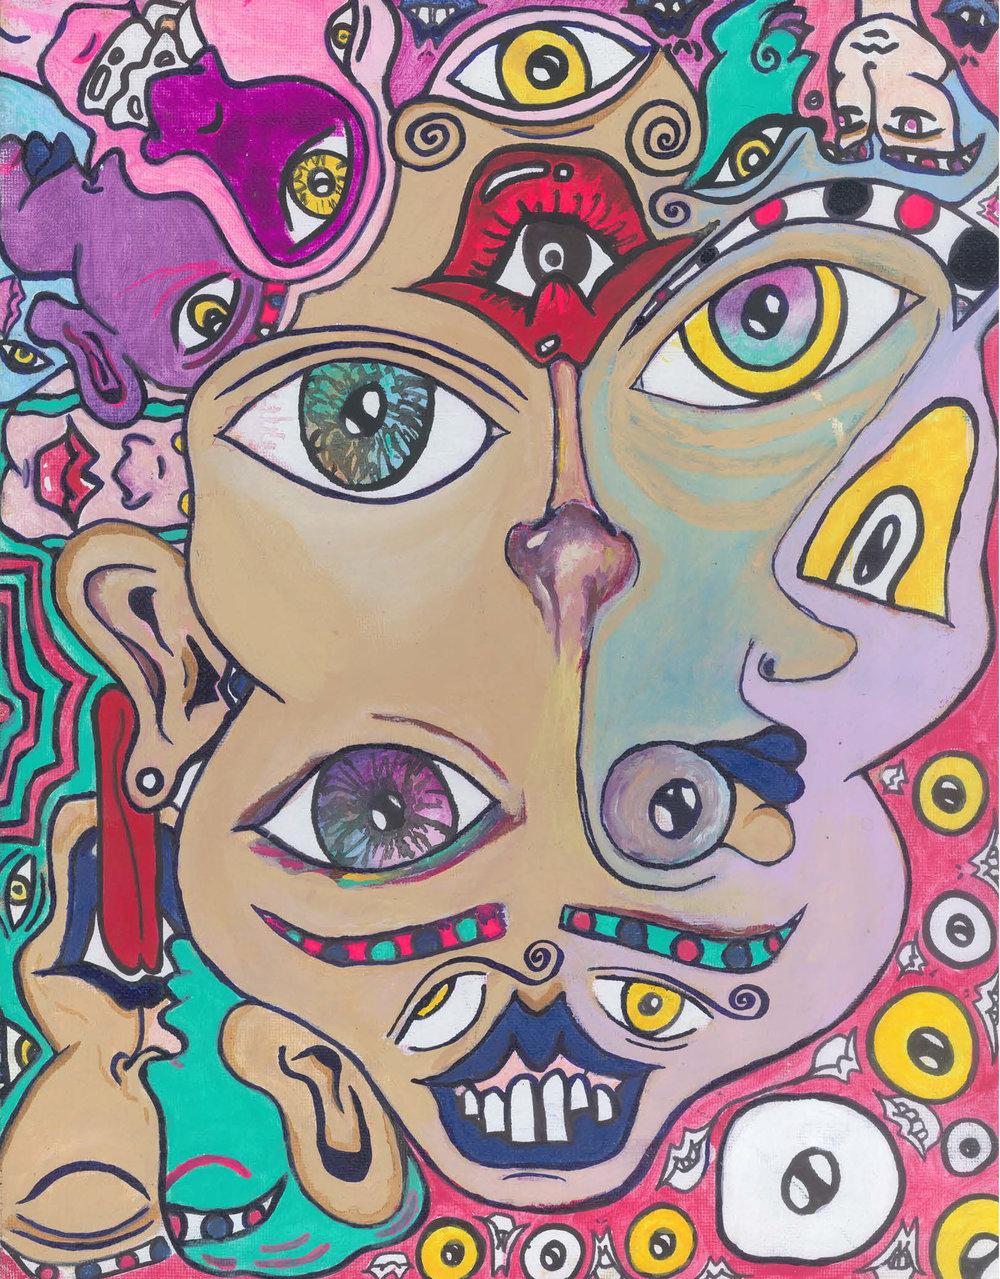 Mimi-Eye of the Beholder-11x14-Acrylic-2018-$475.jpg